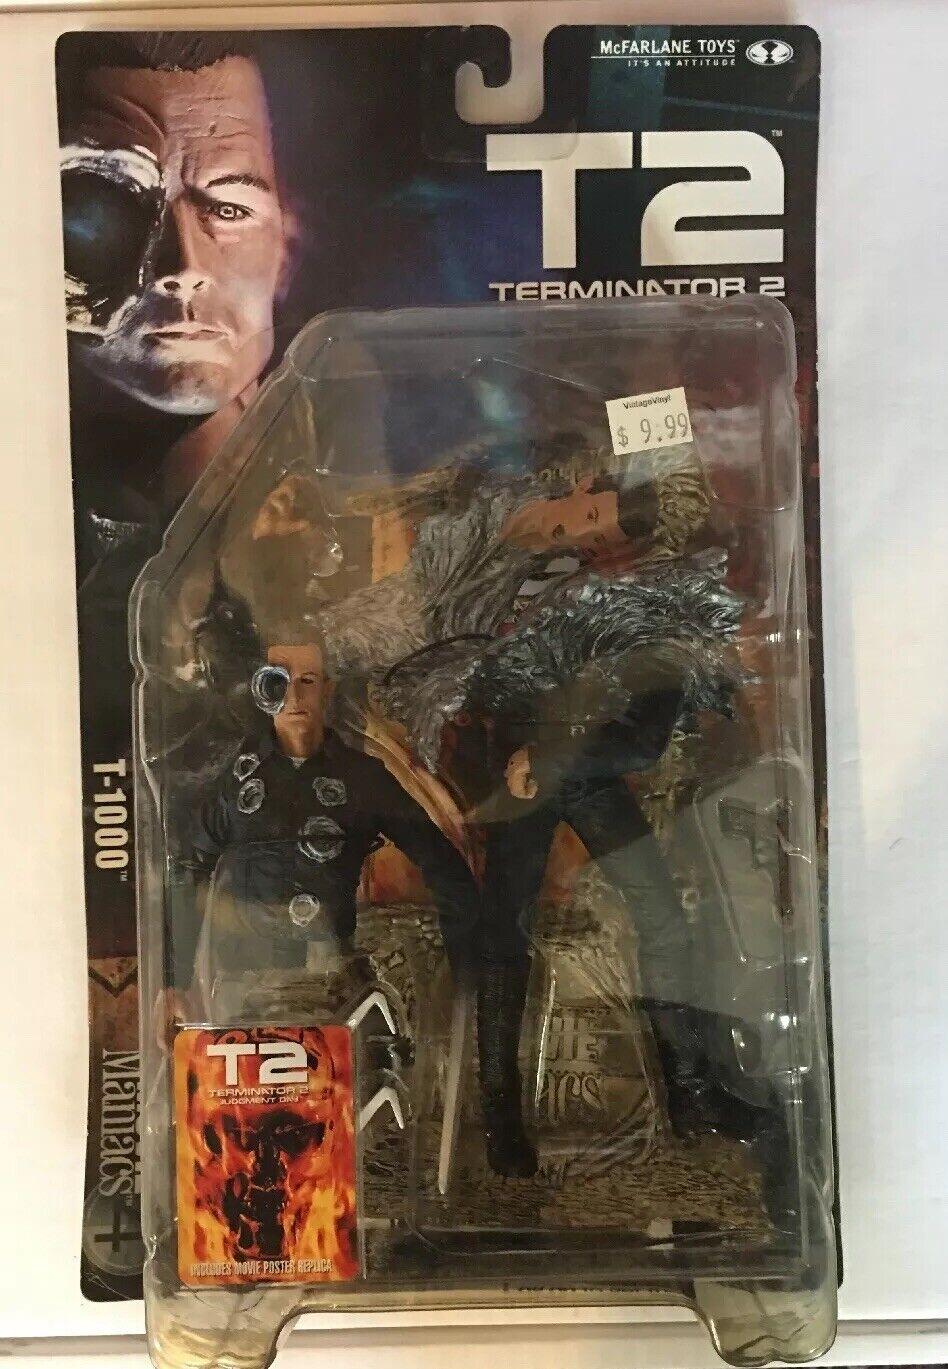 T2 Judgement Day Terminator T-1000 Movie Maniacs 4 McFarlane 2001